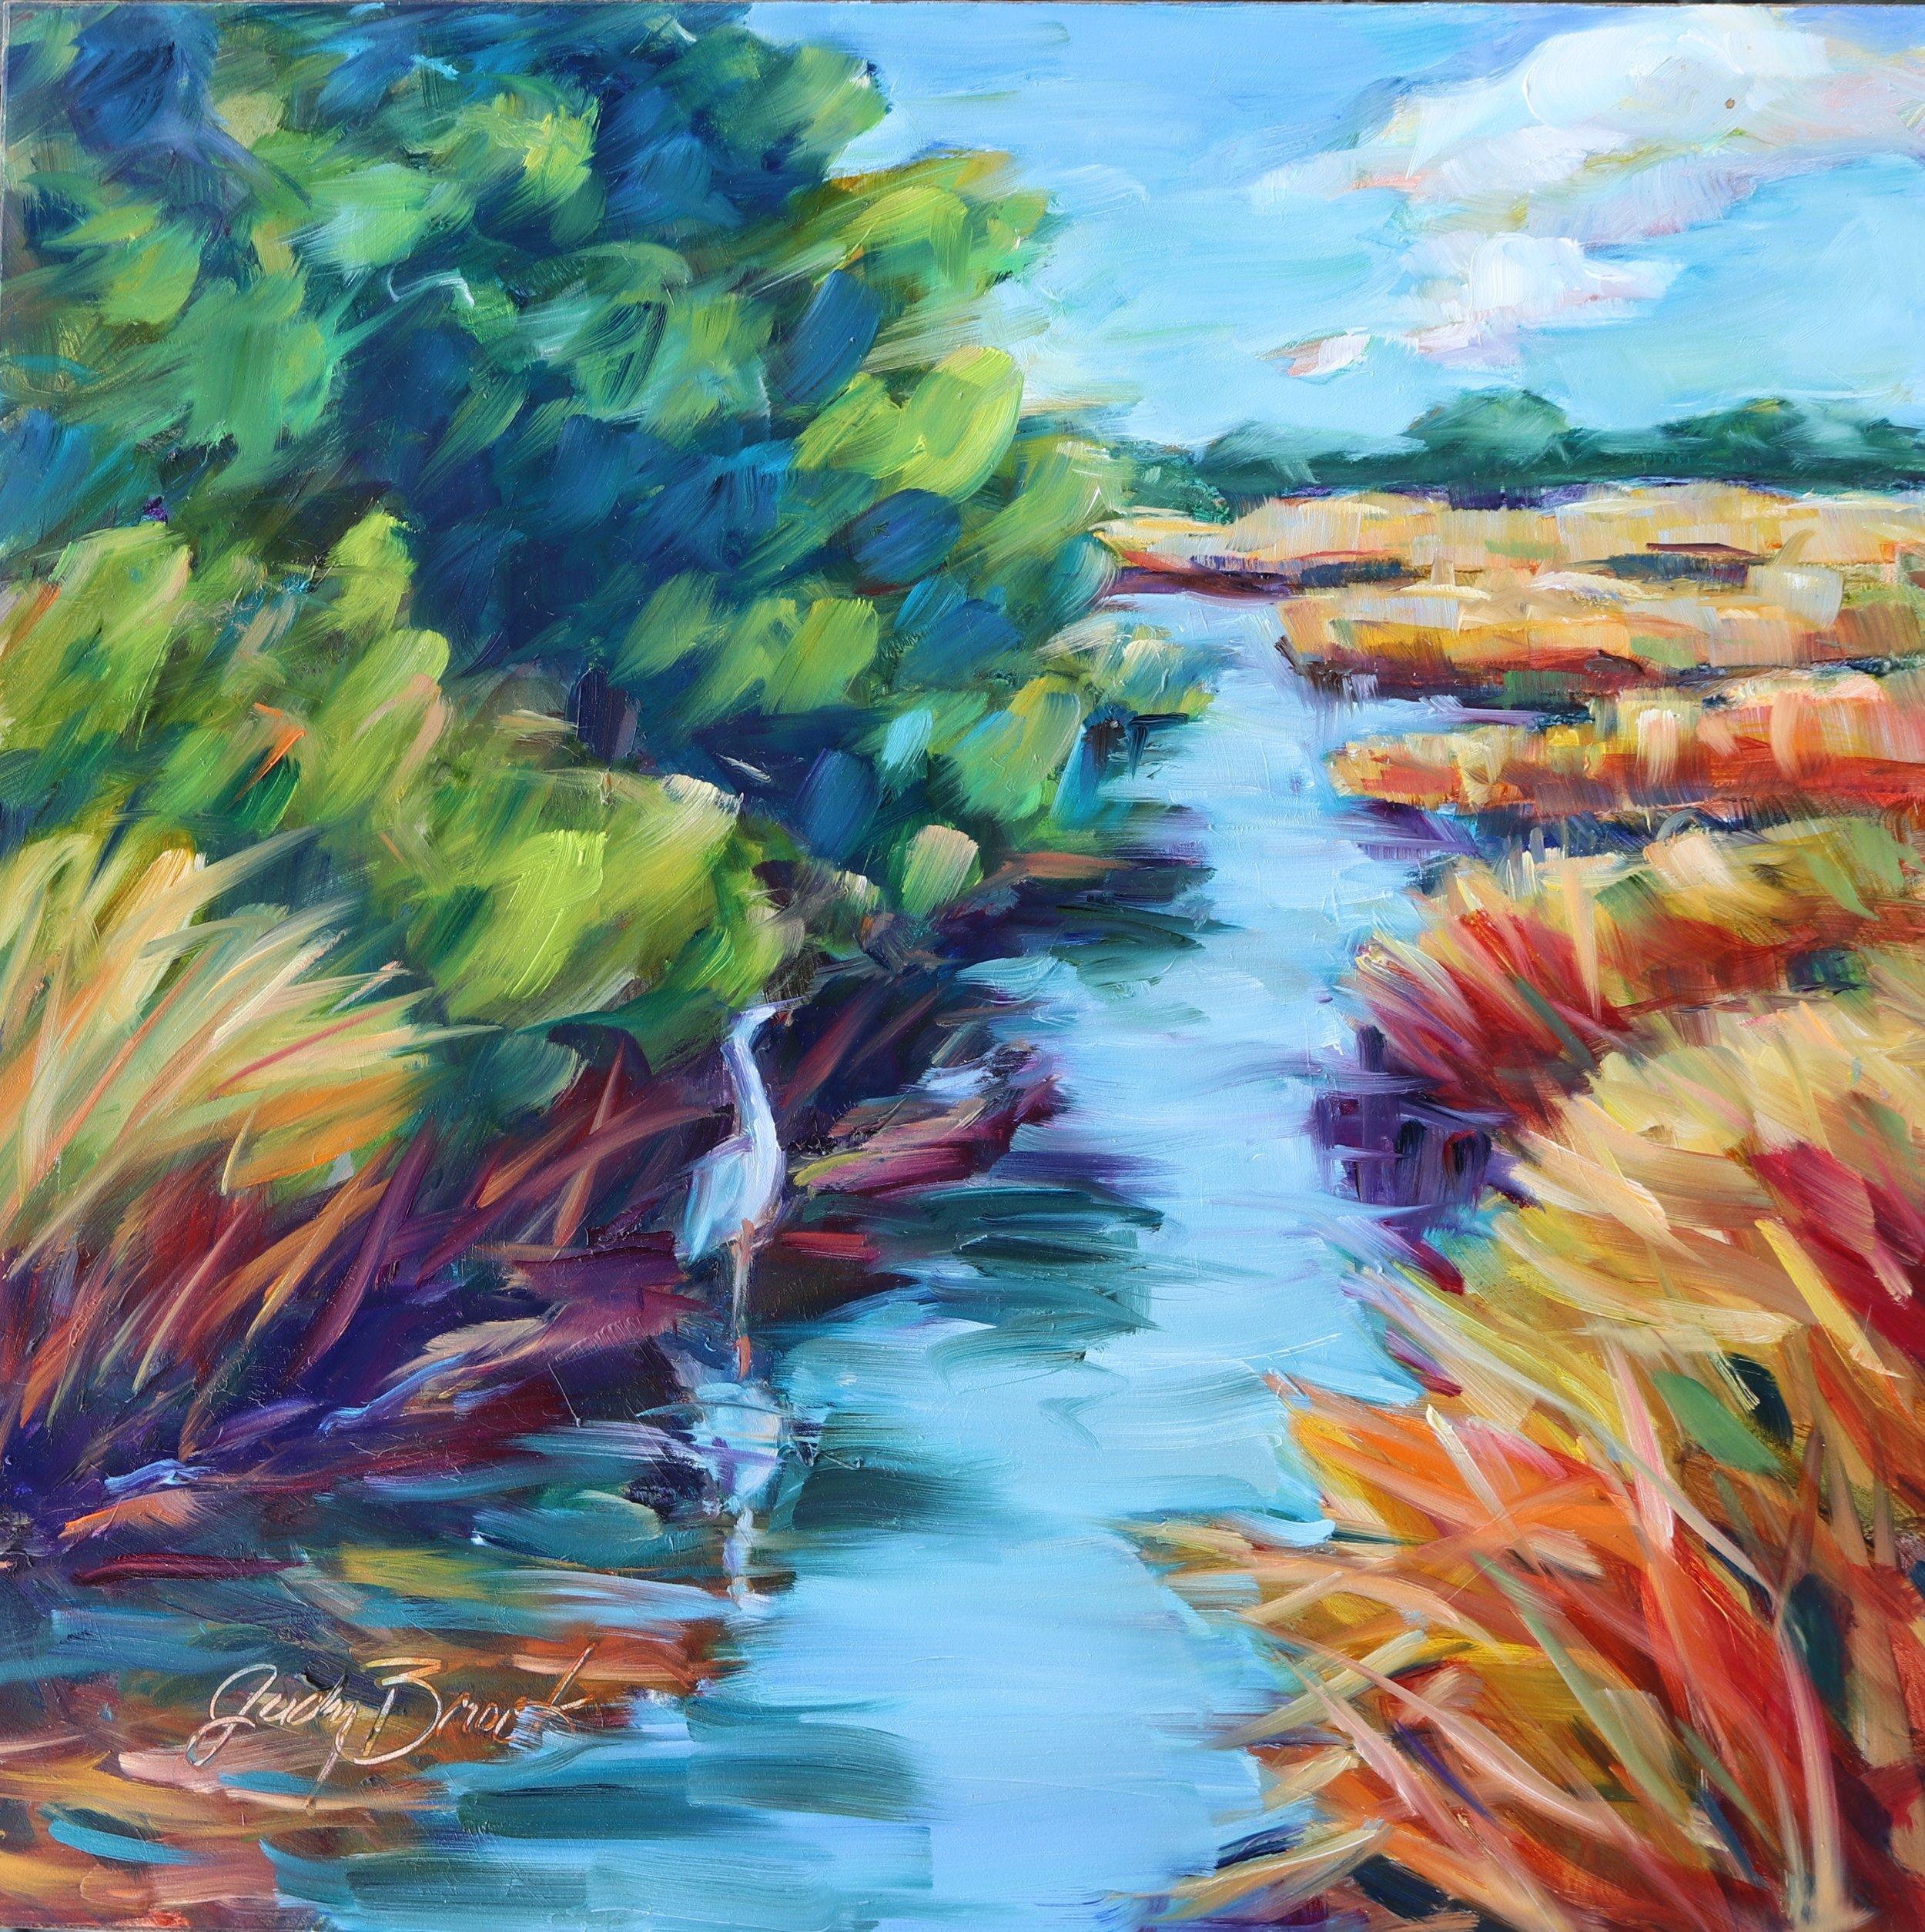 Egret in the Swash